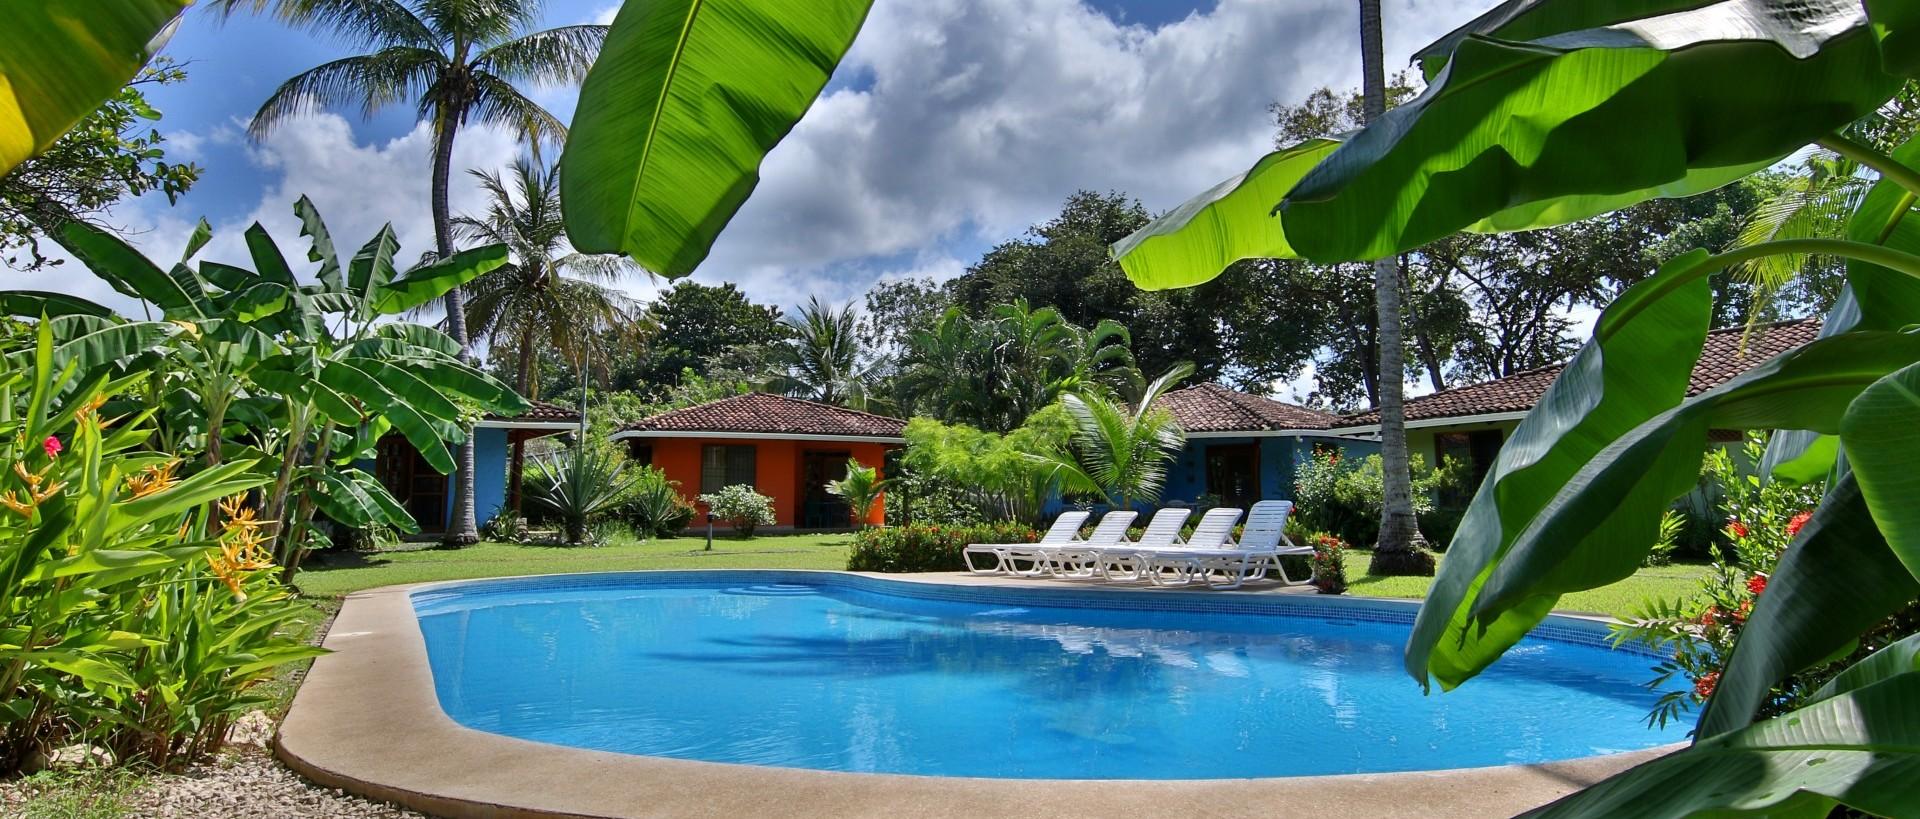 Wonderful tropical garden.